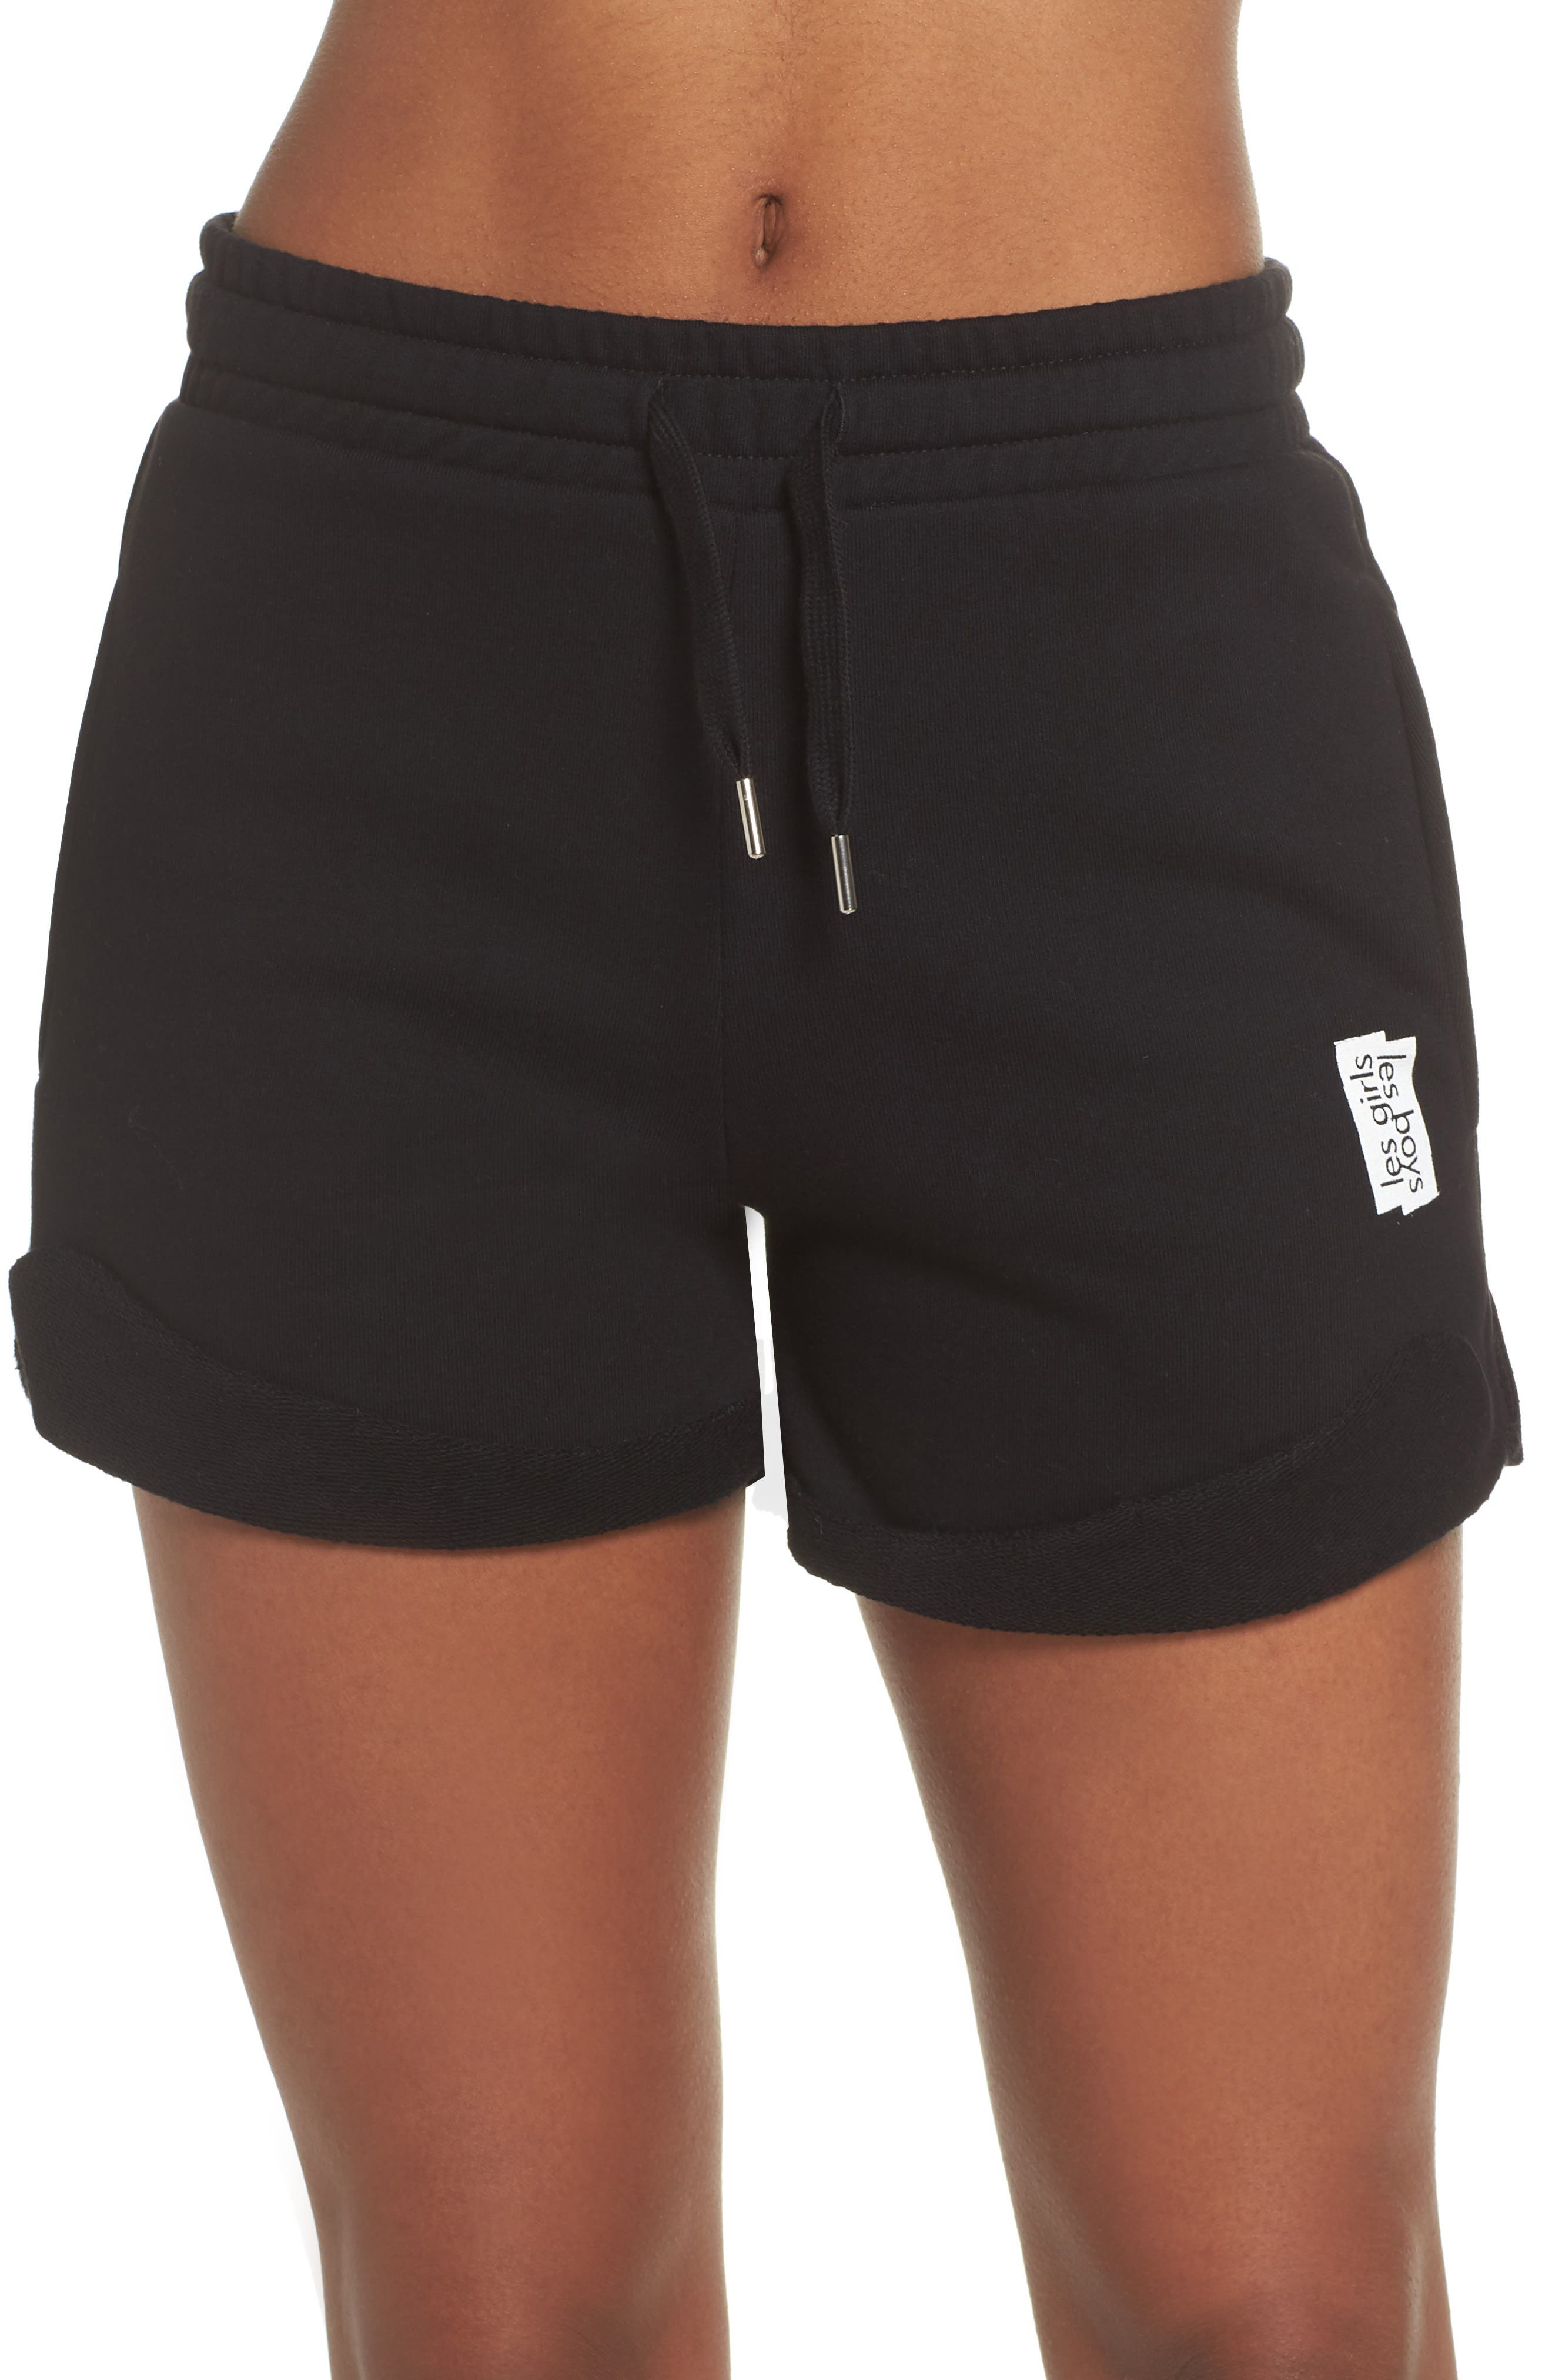 French Terry High Waist Shorts,                             Main thumbnail 1, color,                             002